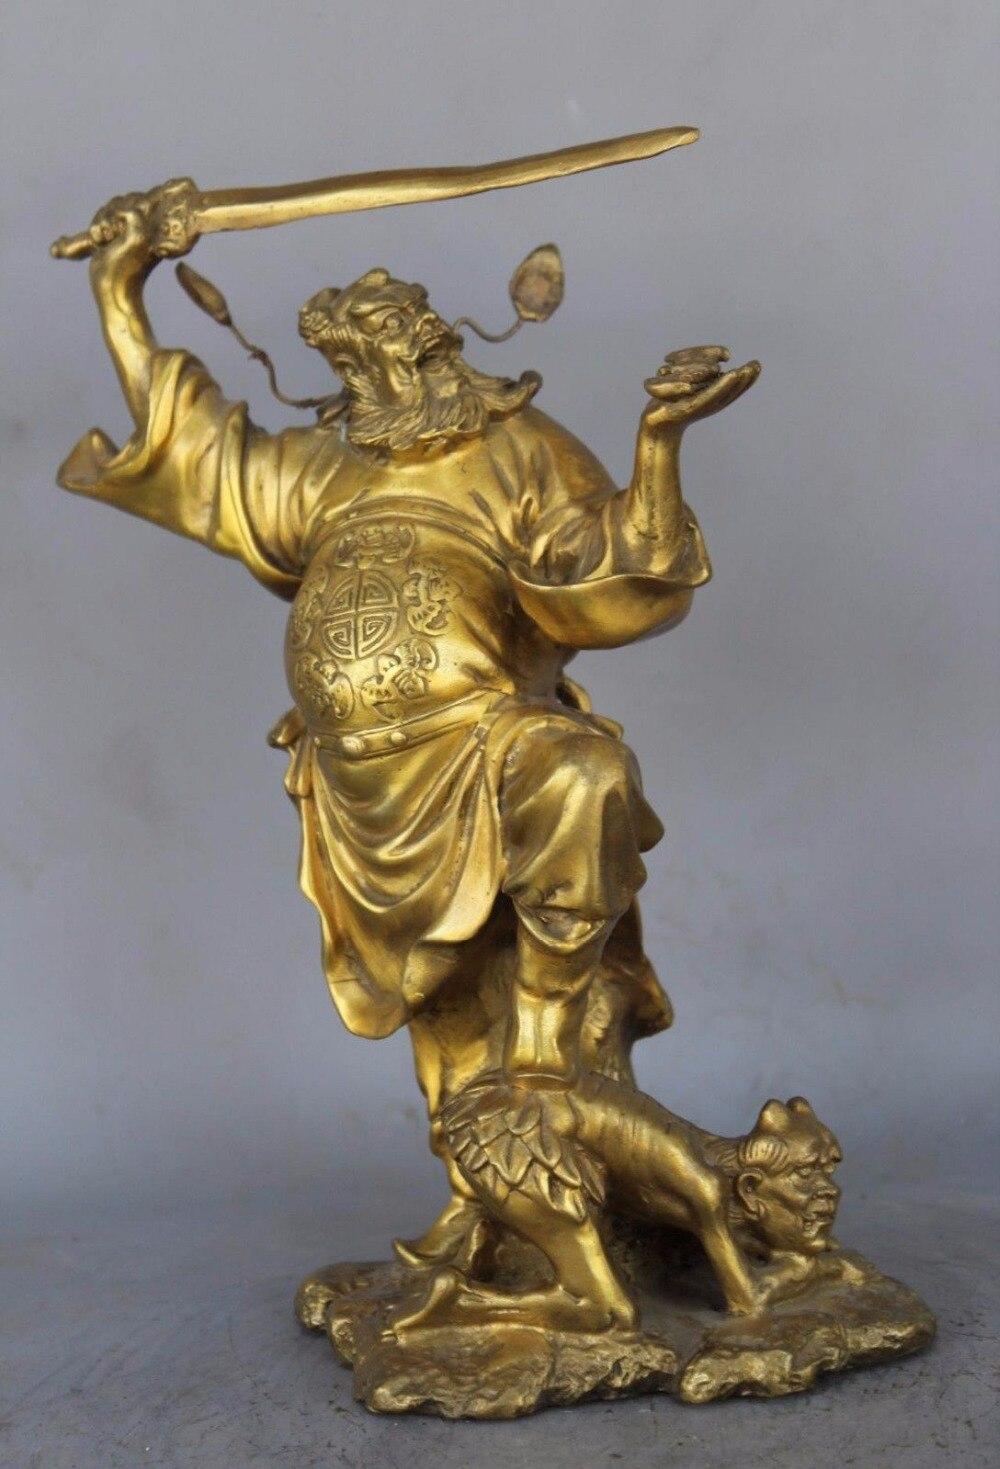 Chinese Pure Brass Zhong Kui ChungKuel God Catch Demon Devil Statue statue